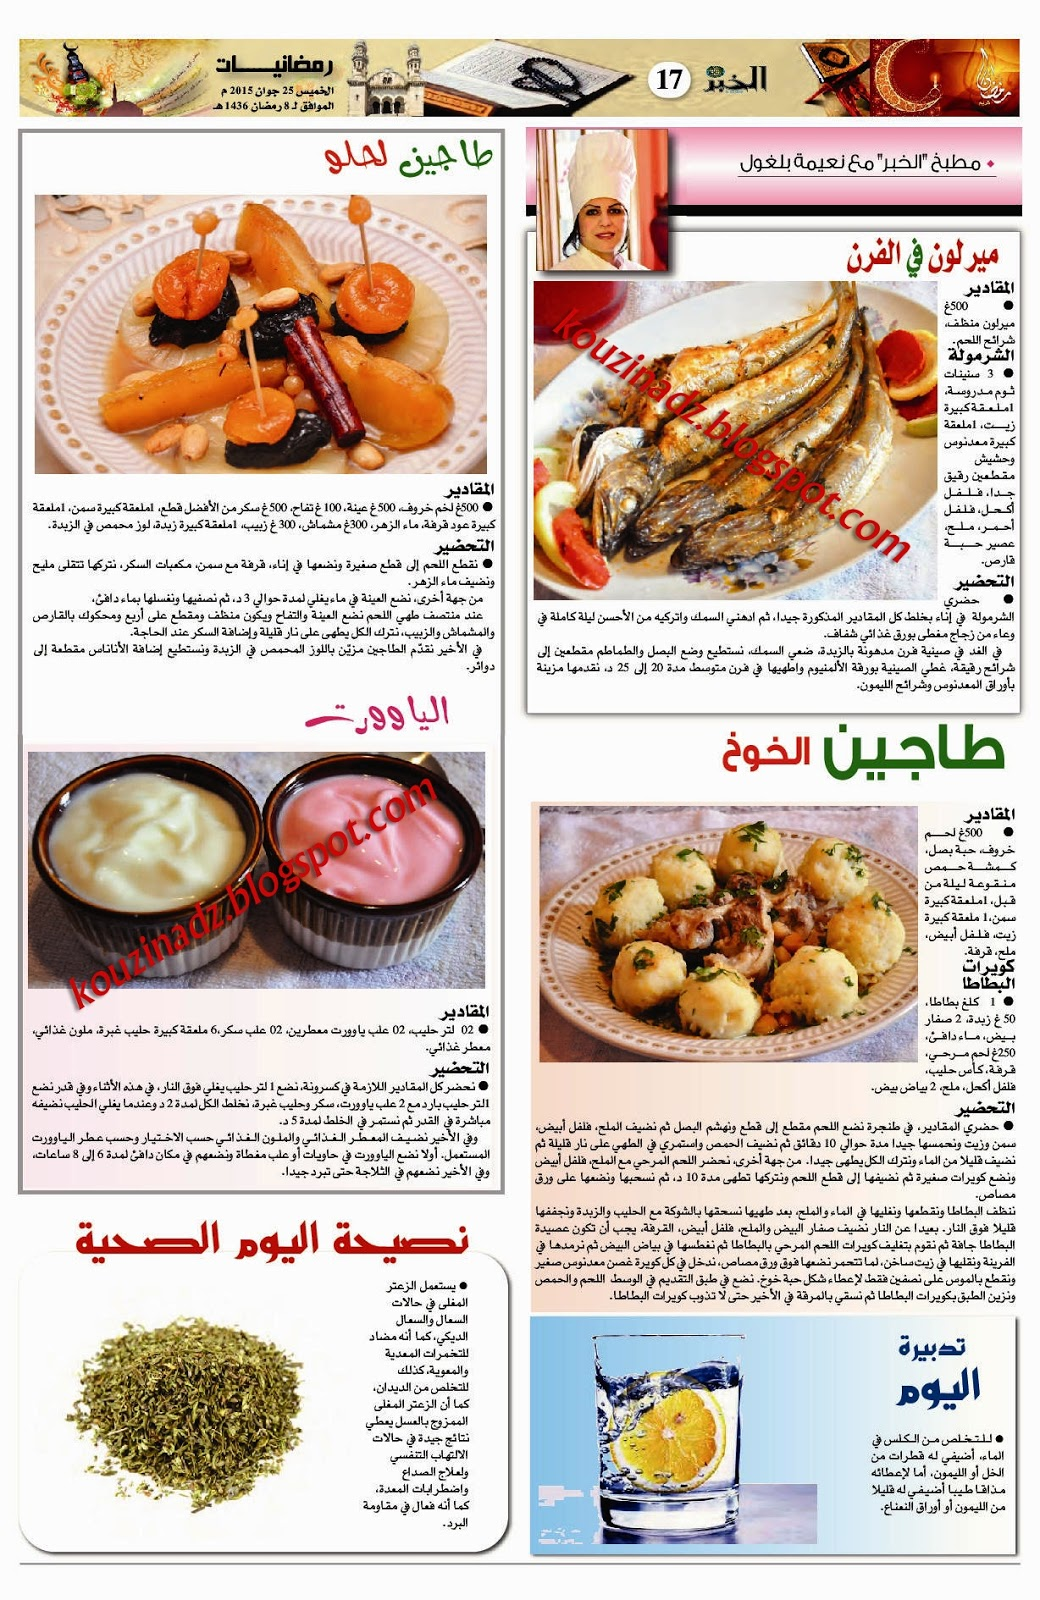 la cuisine alg 233 rienne وصفات الخبر الرمضانية